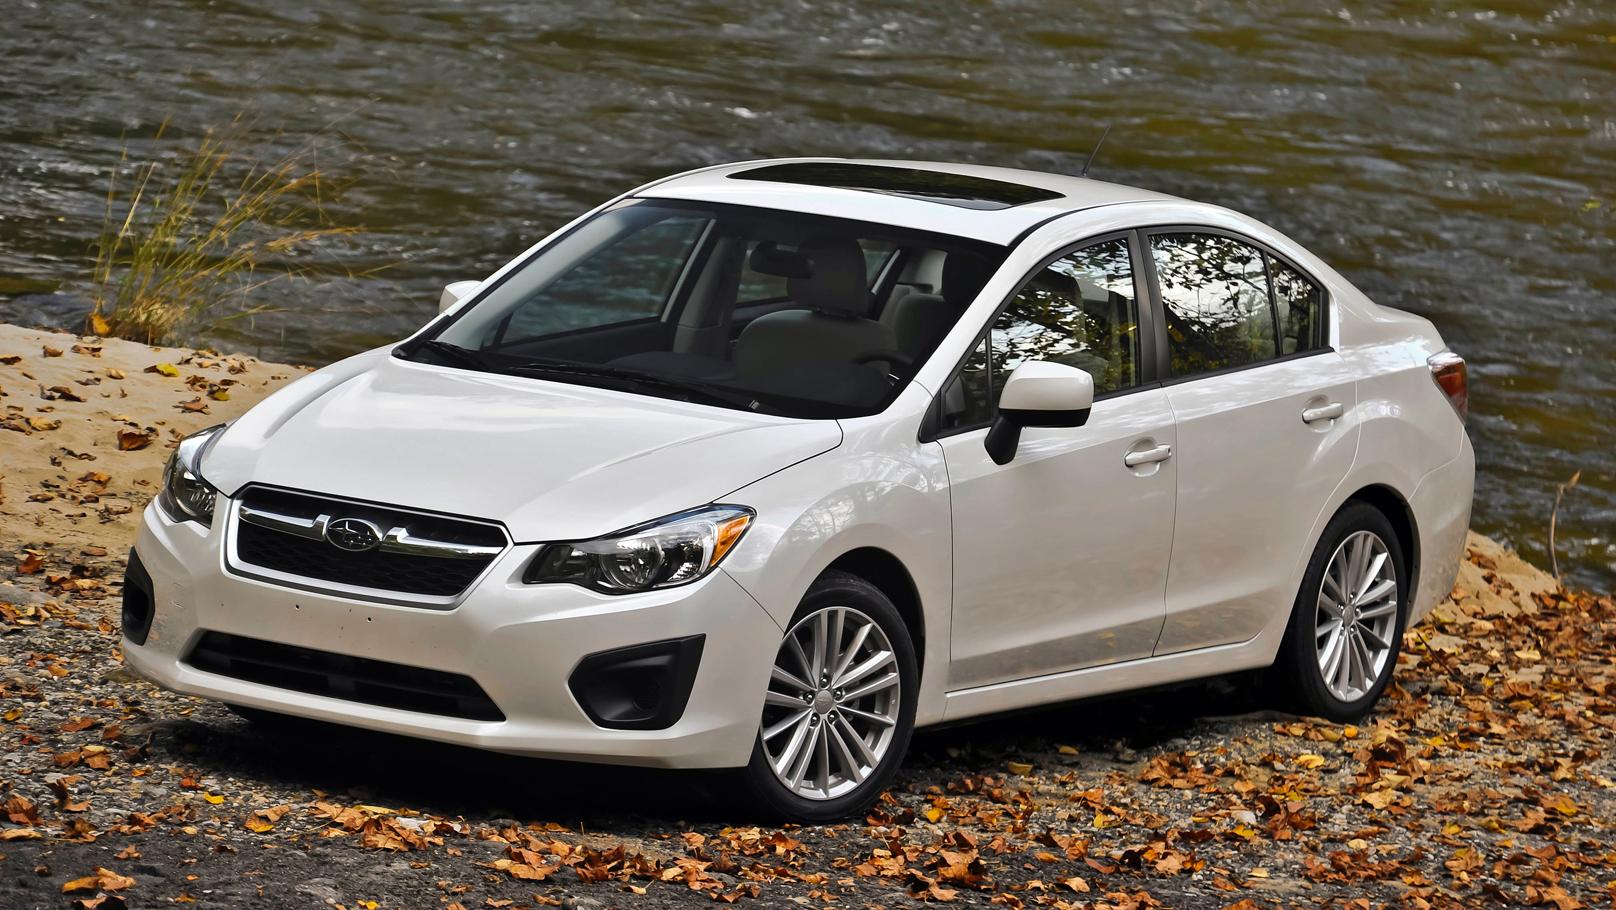 Buying Used 2012 16 Subaru Impreza 2011 Fuel Filter Location